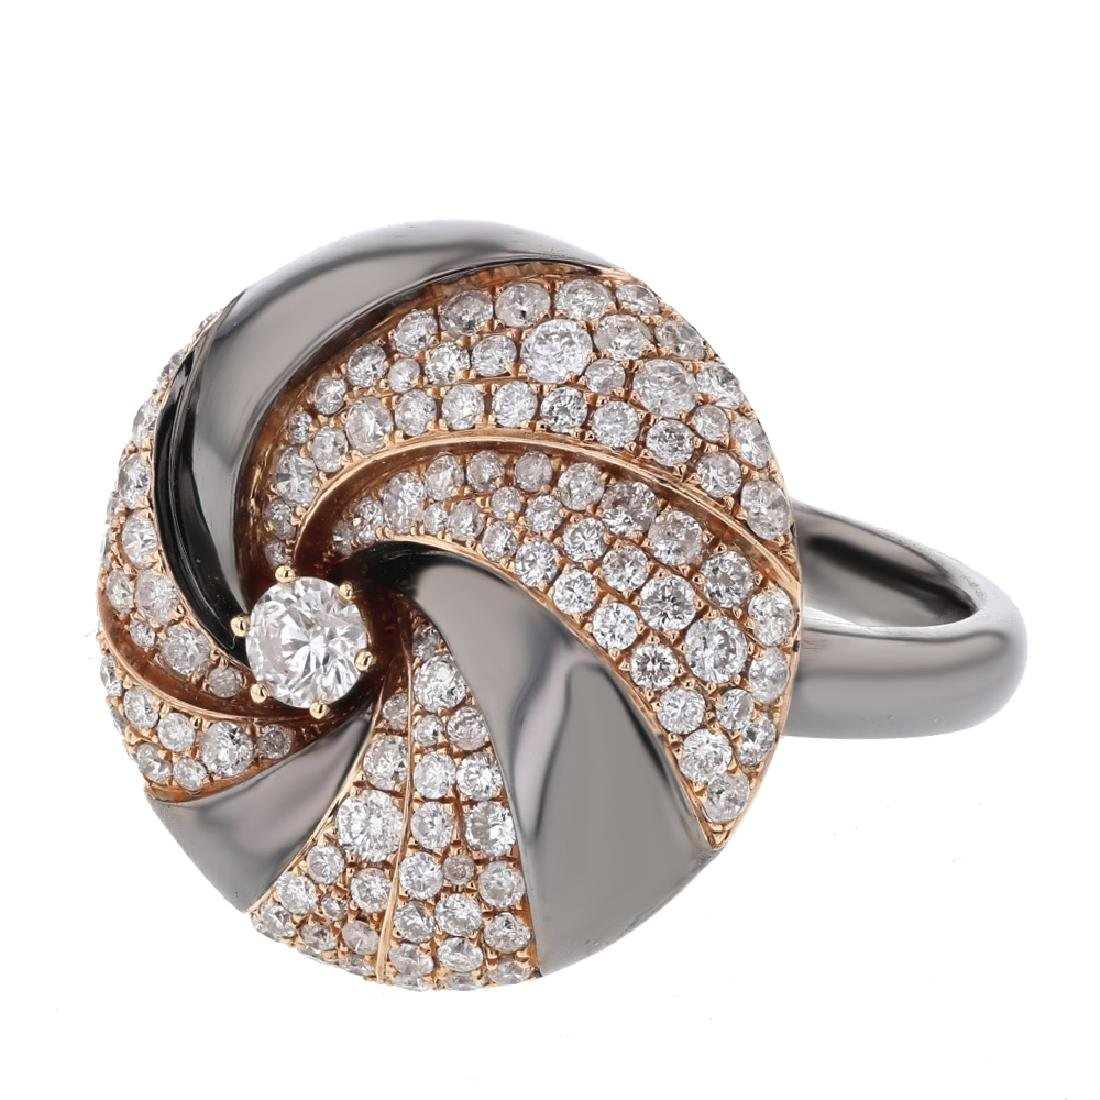 1.28 CTW Diamond Fashion  Ring in 14K Two Tone Yellow